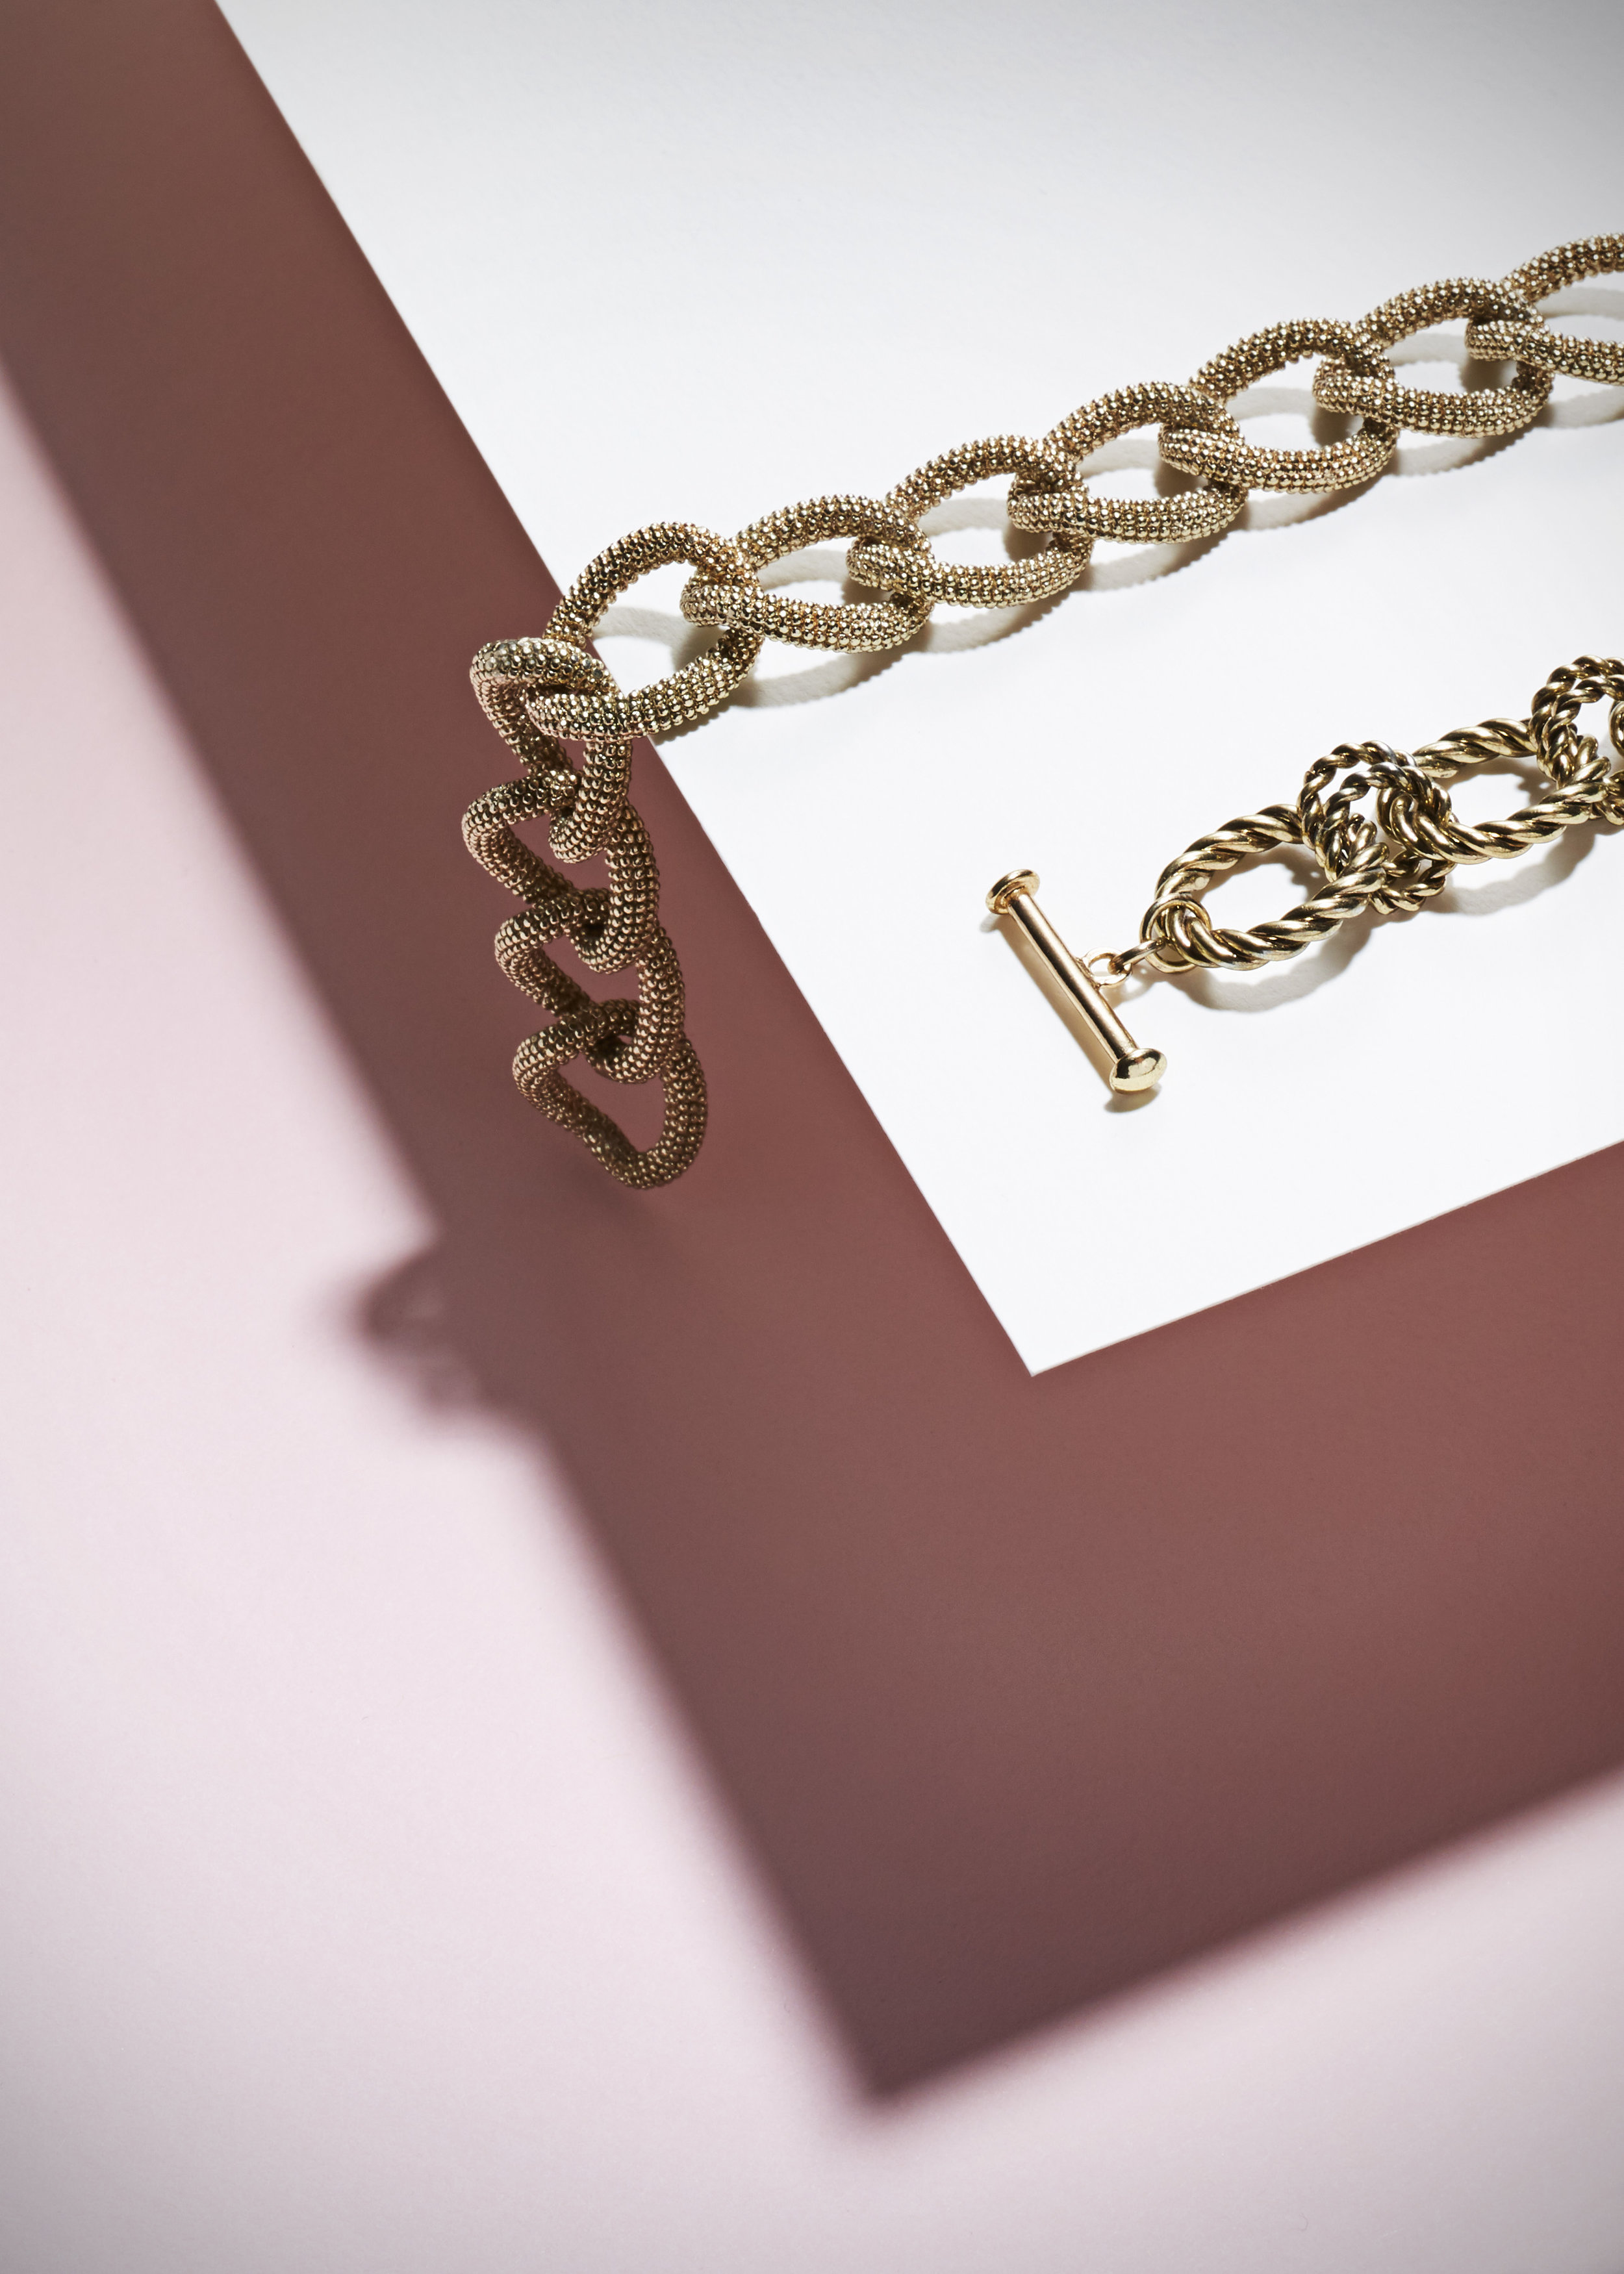 necklace_goldMickie_Clark-sethiversonphoto_2_5583 1.jpg